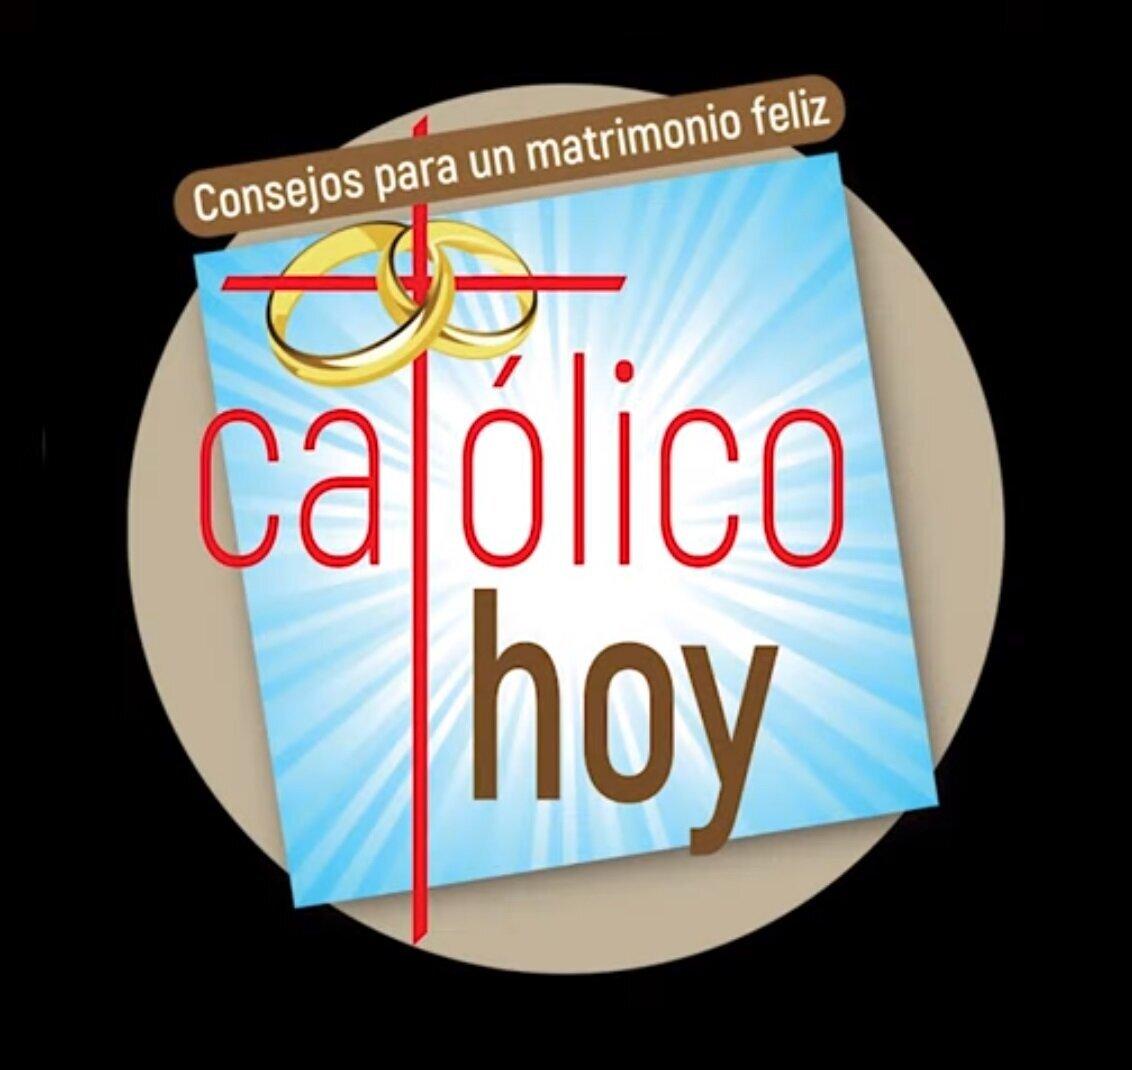 Diacono+Elix+-+Catolico+Hoy+-+Consejos+para+un+matrimonio+feliz+-+Detalles.jpg